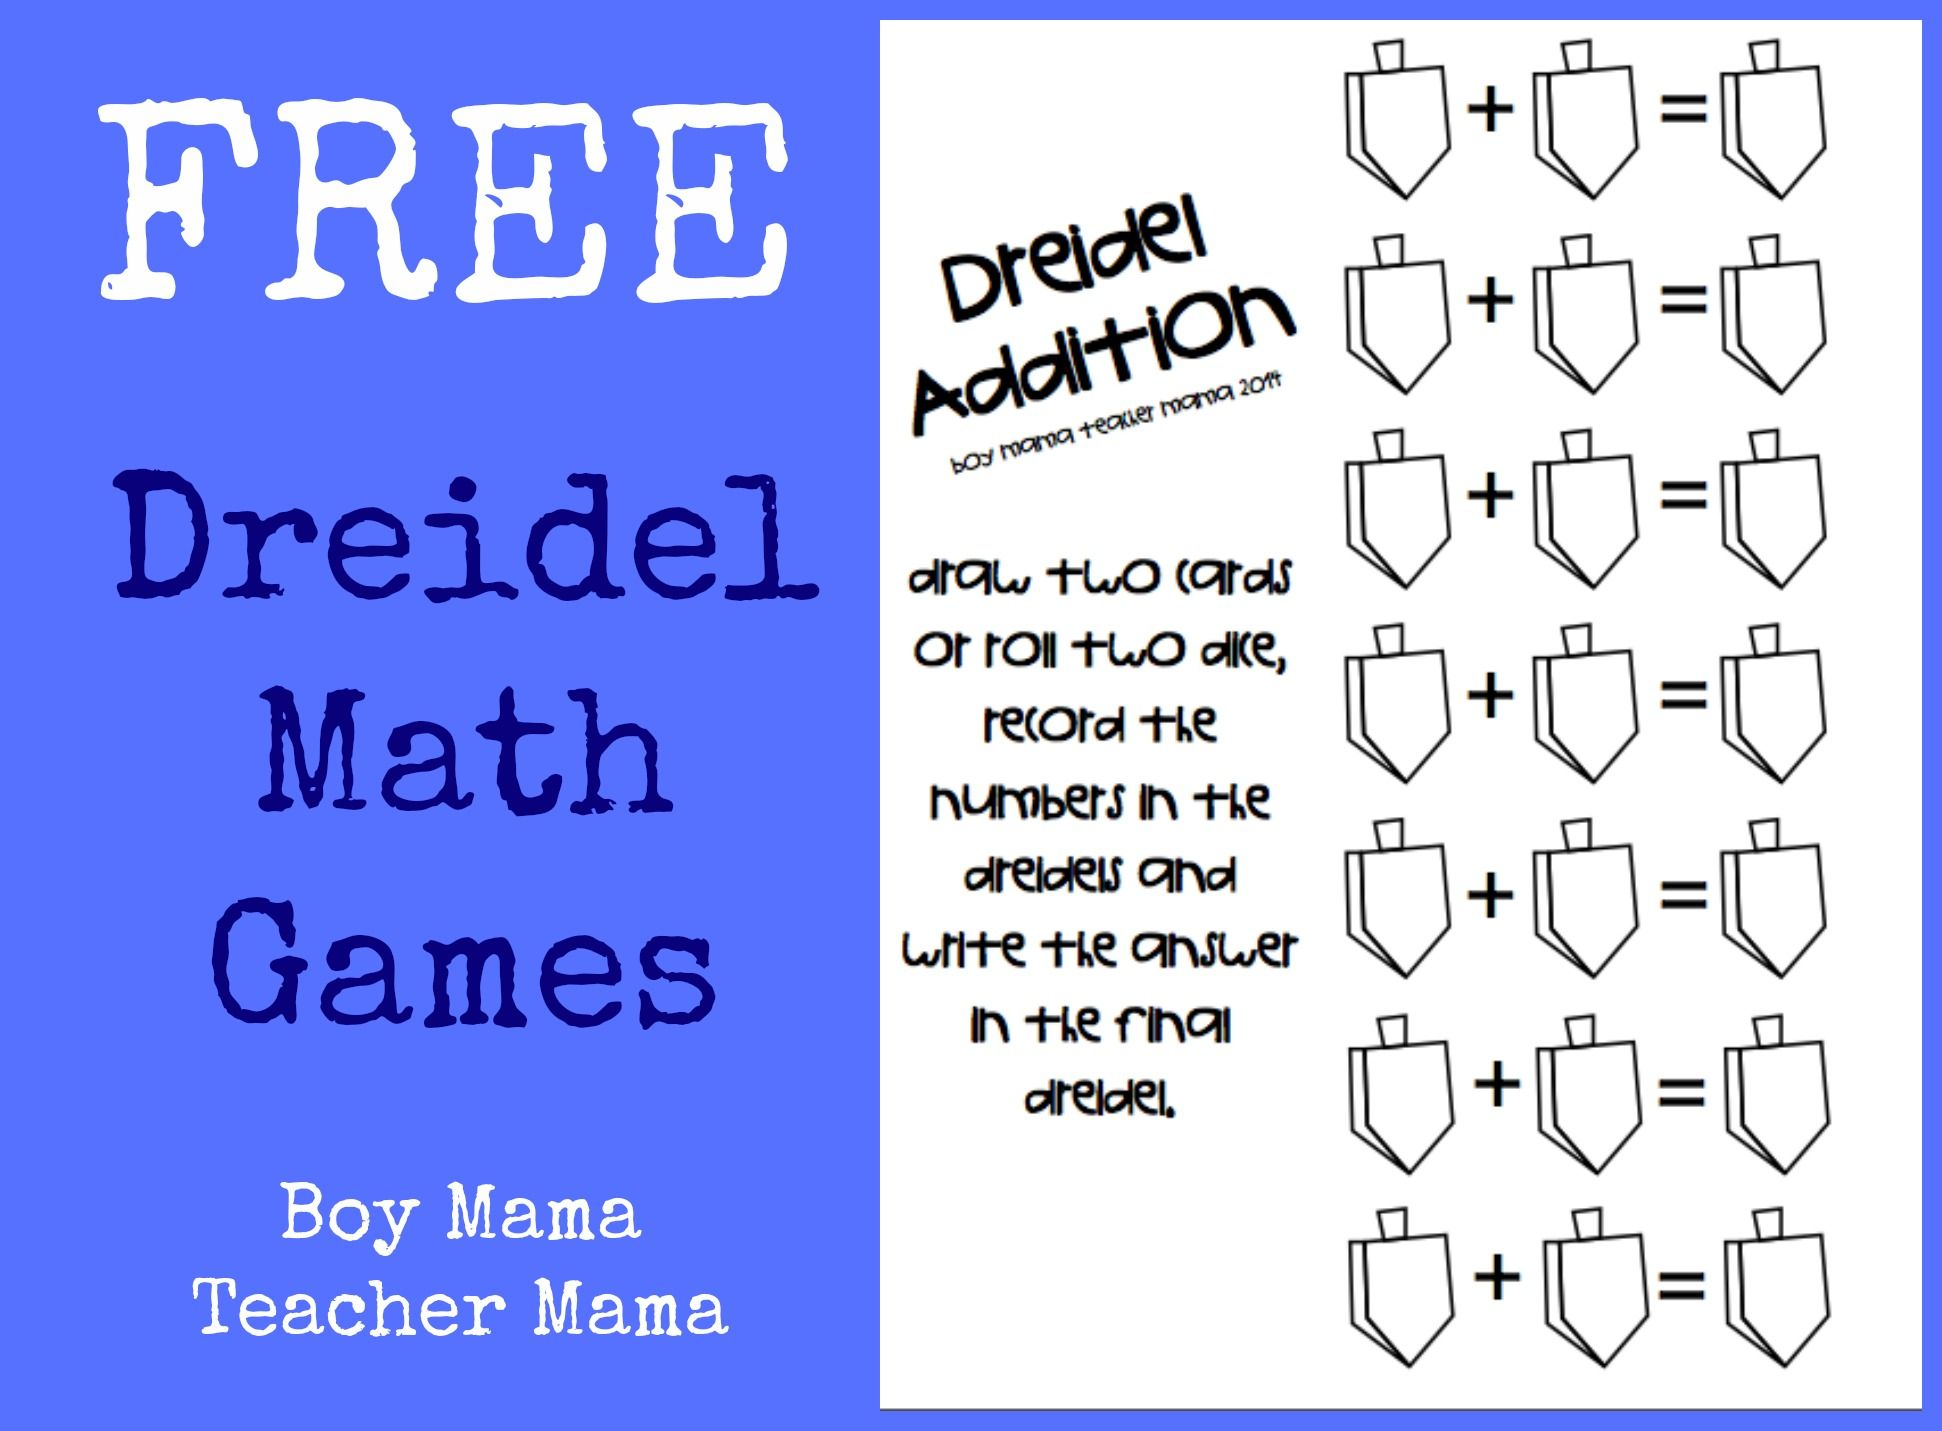 Boy Mama Teacher Mama Free Printable Dreidel Math Game